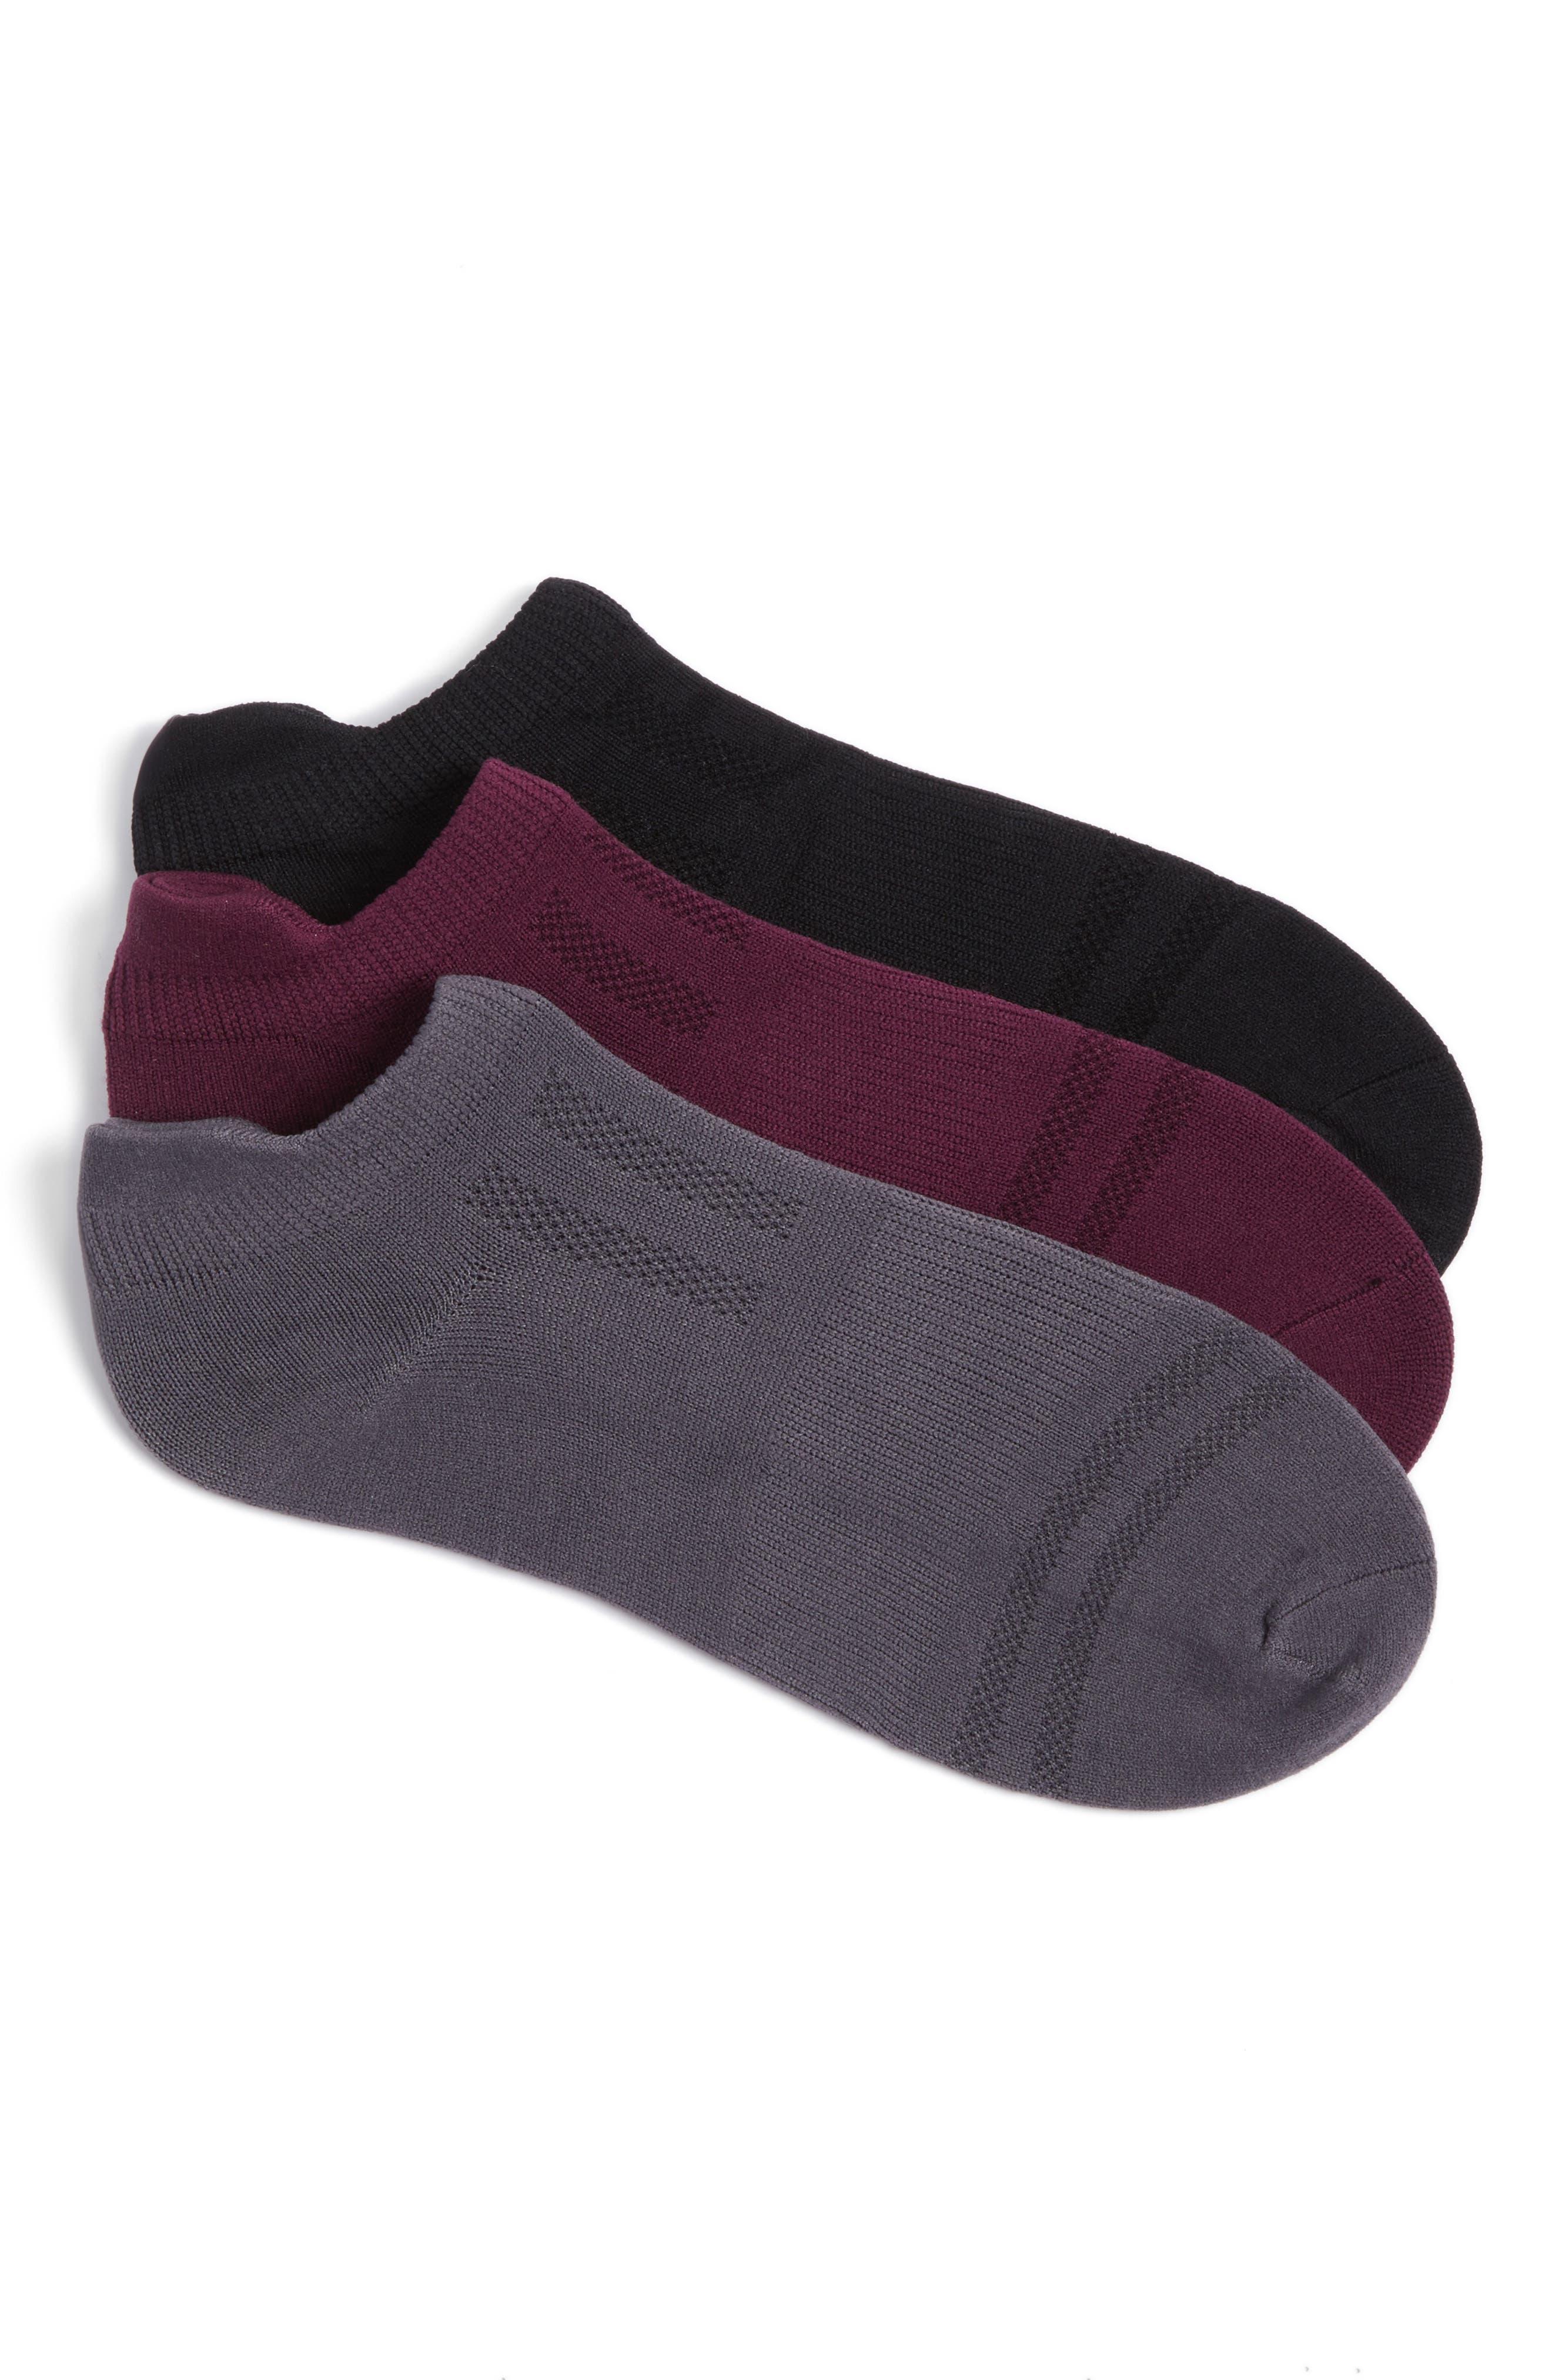 Alternate Image 2  - Sof Sole 3-Pack Low Cut Socks